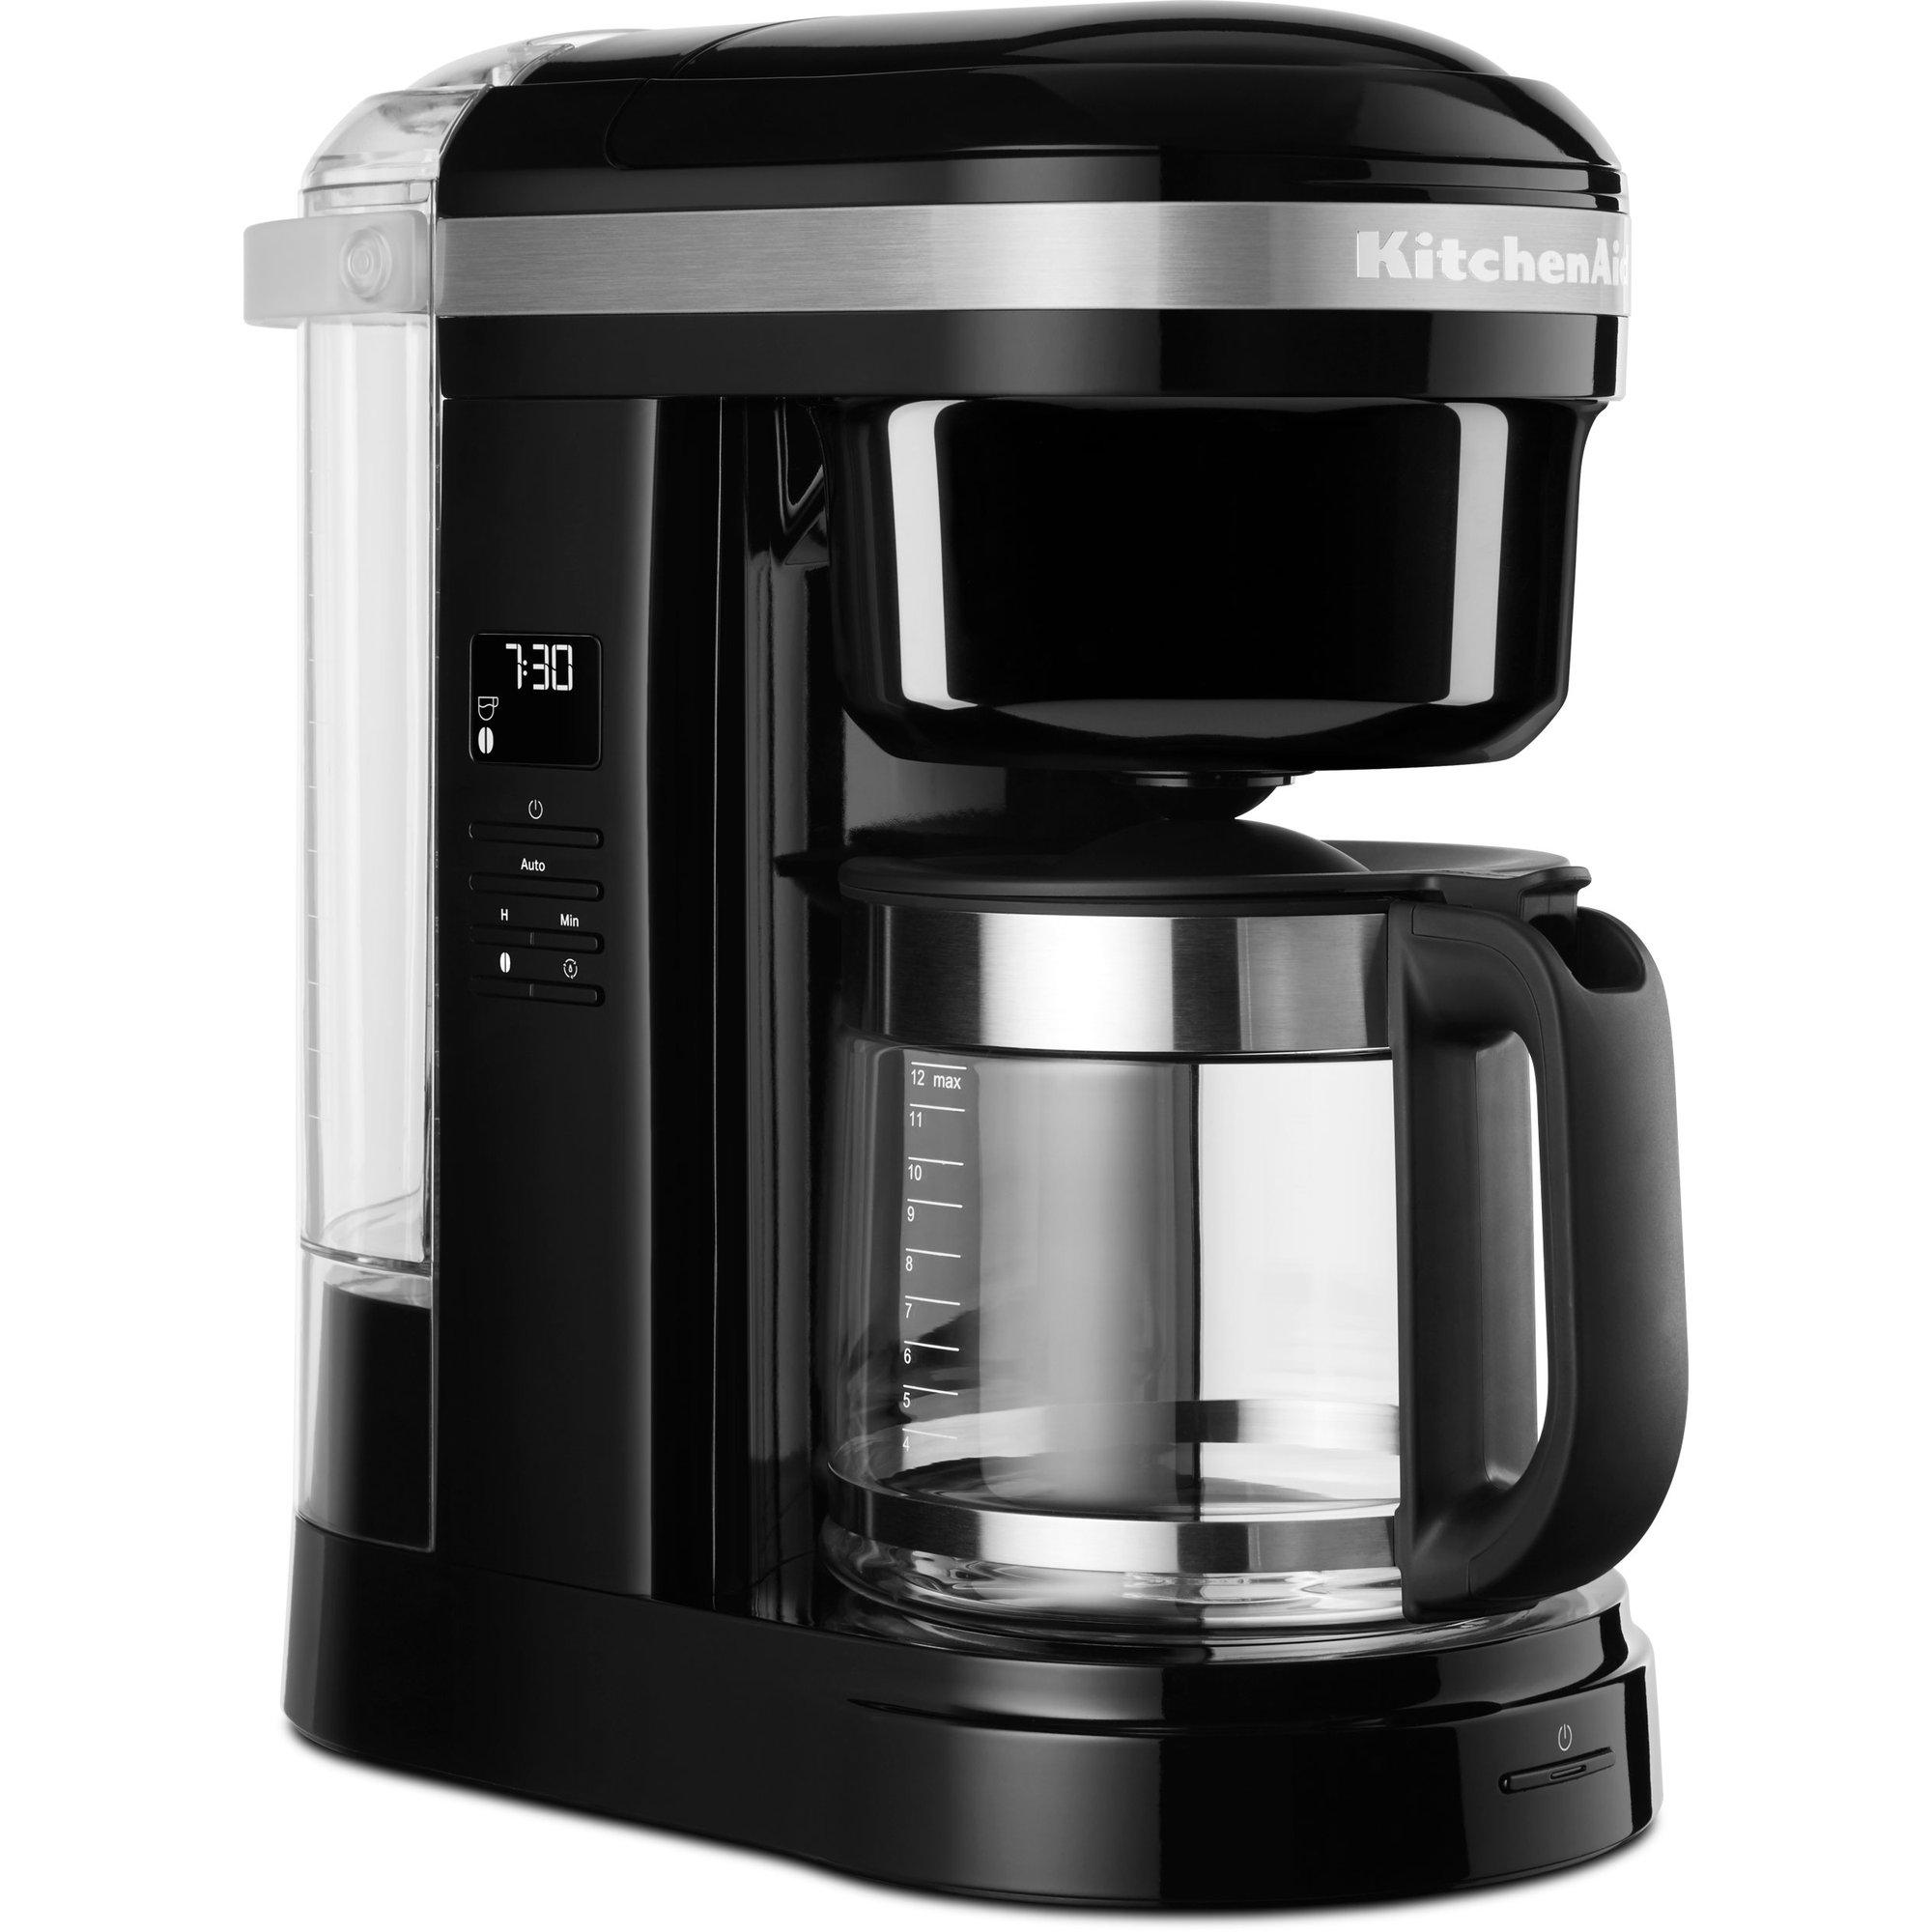 KitchenAid Classic 5KCM1209EOB kaffebryggare Onyx Black